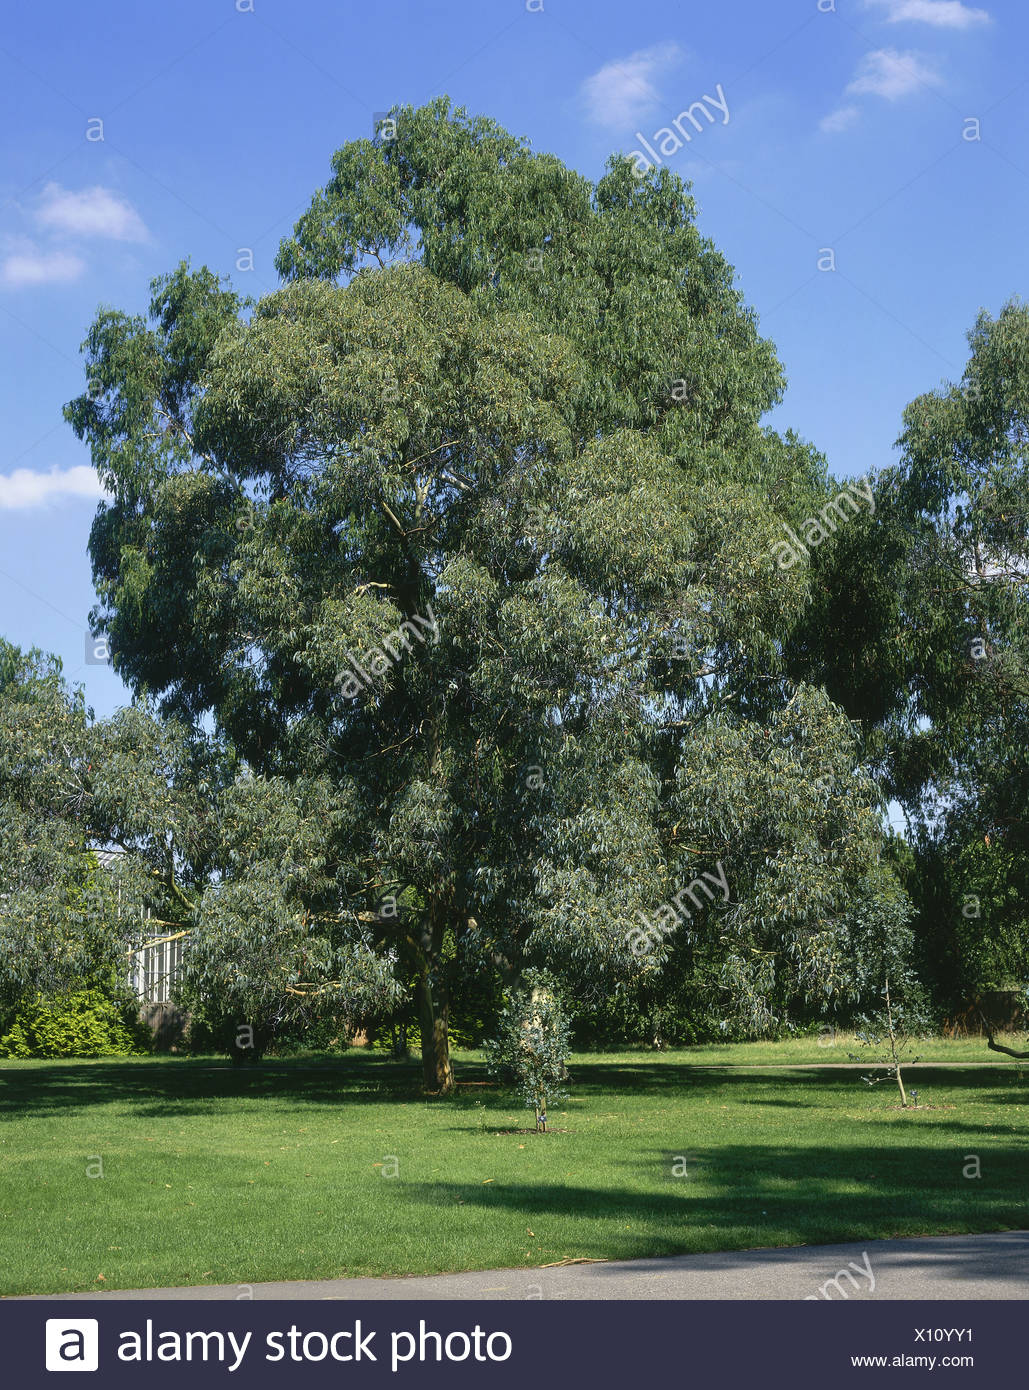 botaniy, Eucalyptus glancescens, 'Tingiringi Gum' at Kew Gardens, London, Great Britain, Additional-Rights-Clearance-Info-Not-Available - Stock Image